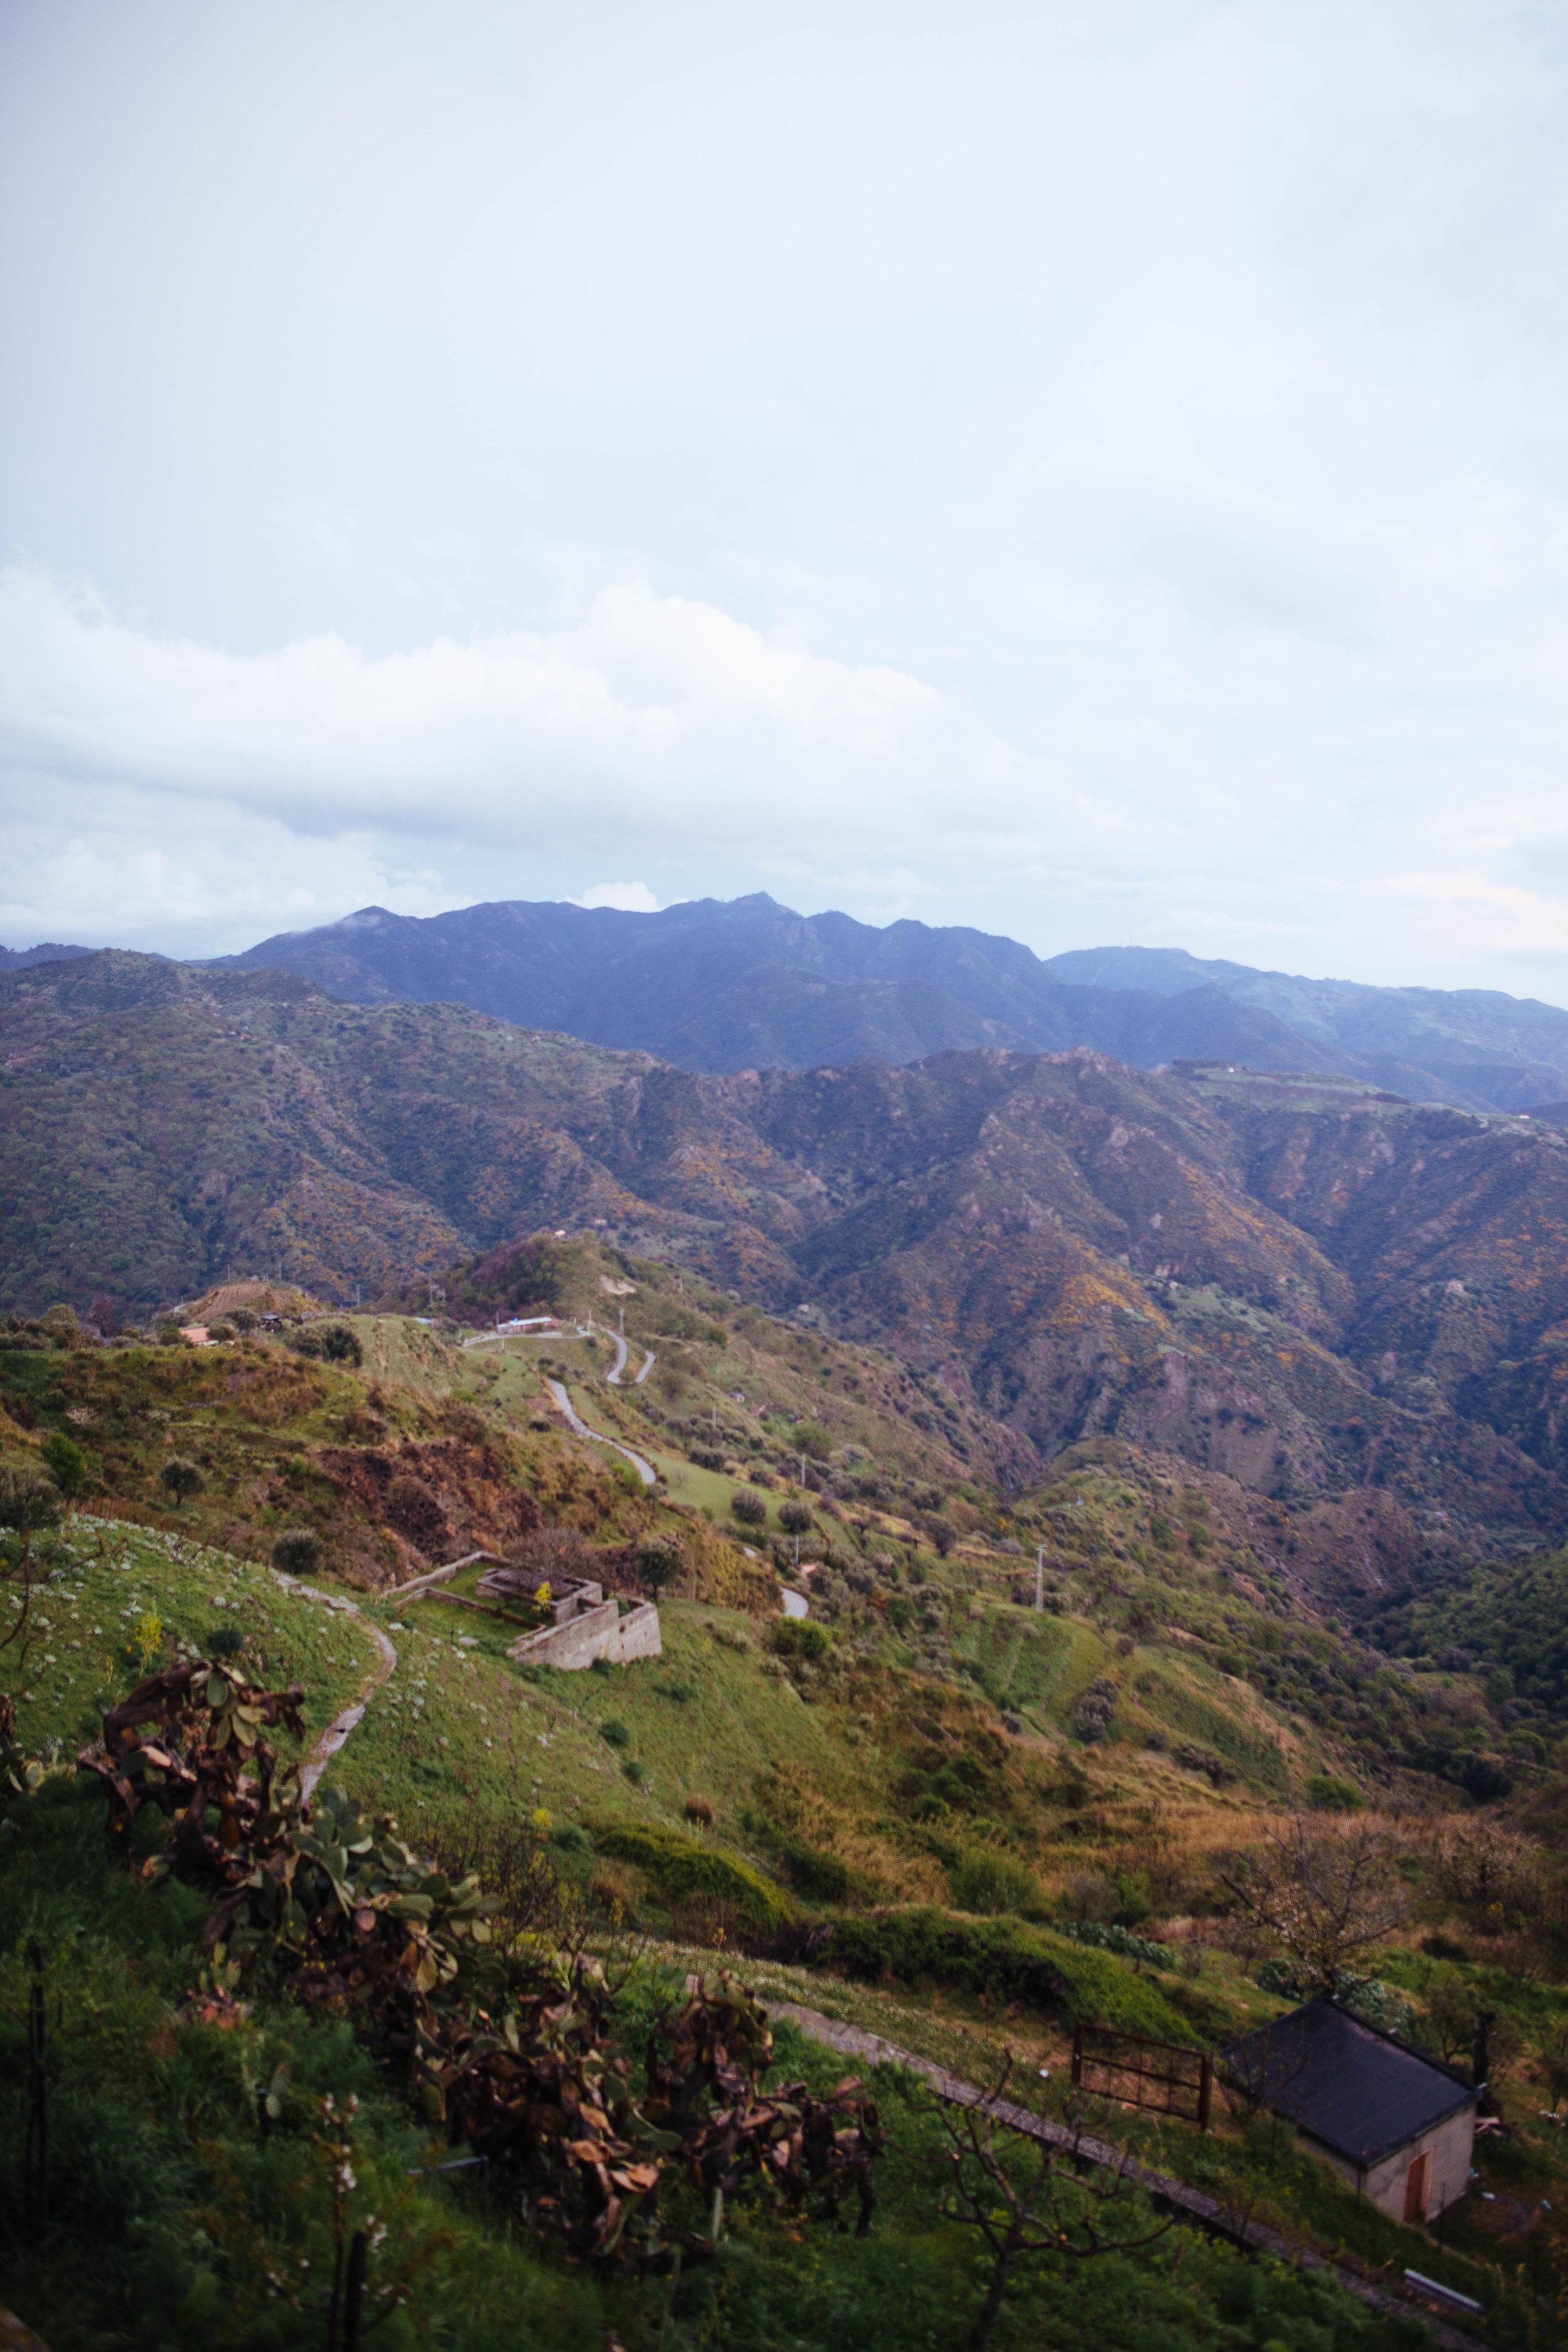 The mountainous countryside surrounding Bova.